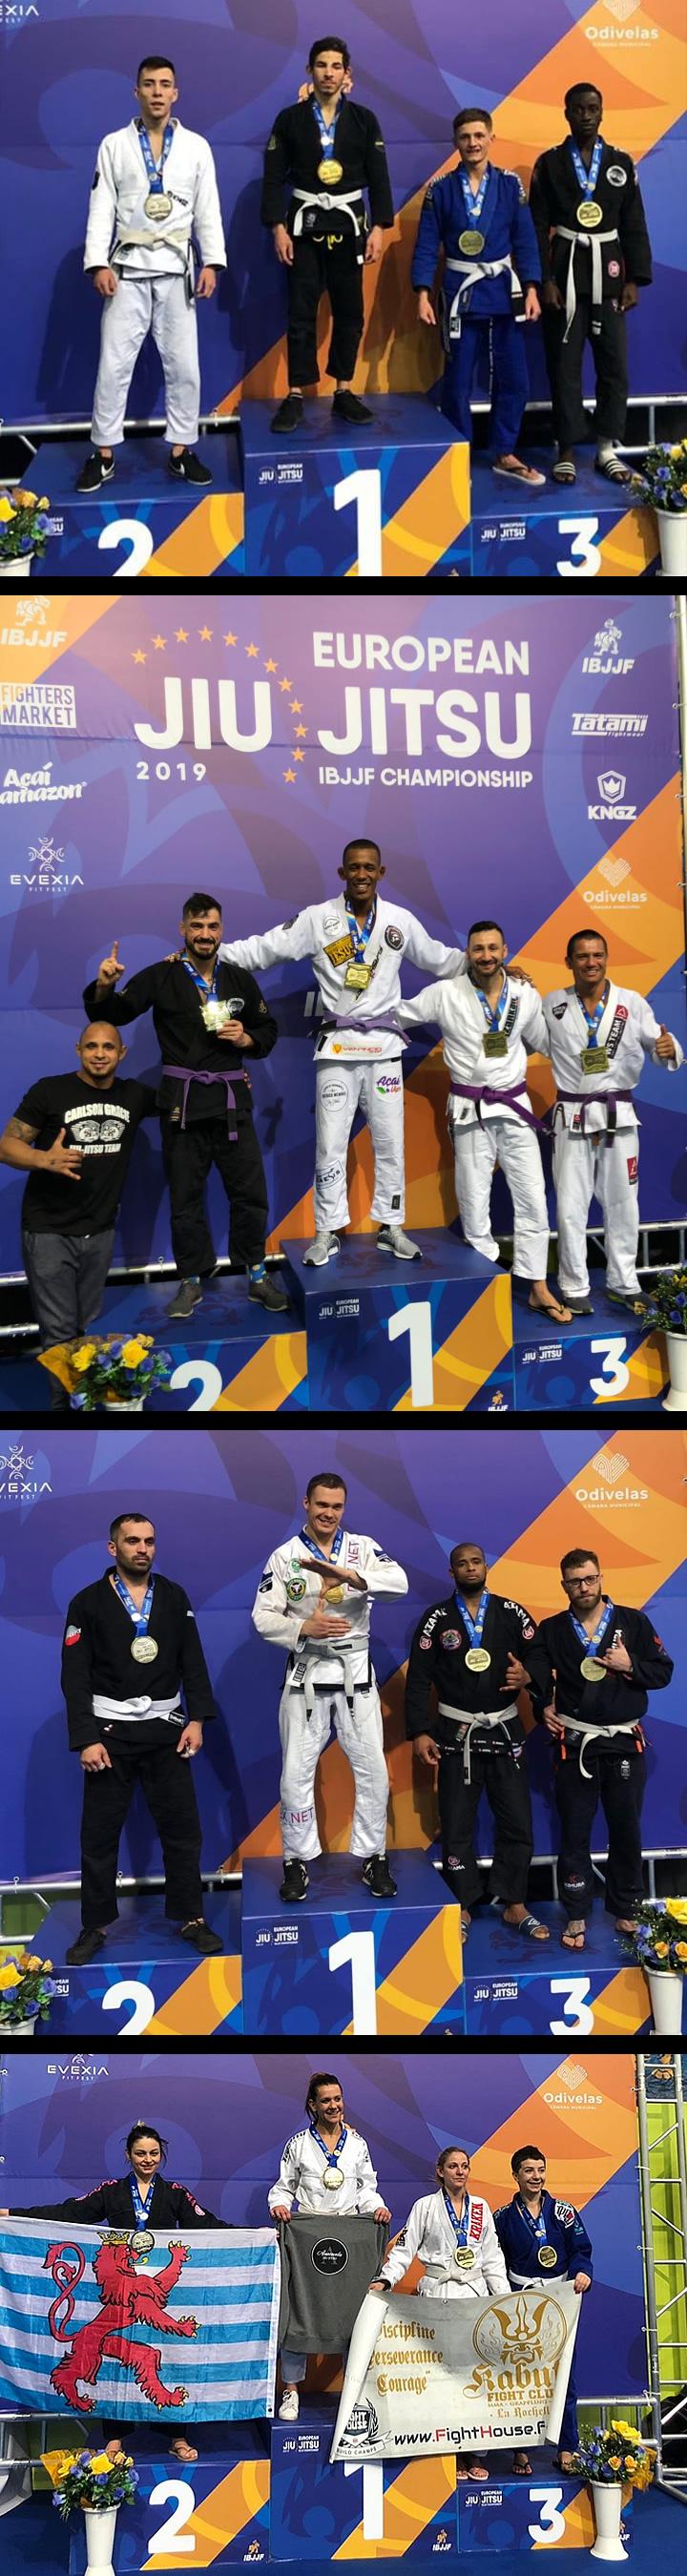 Résultats au Championnat Européen IBJJF